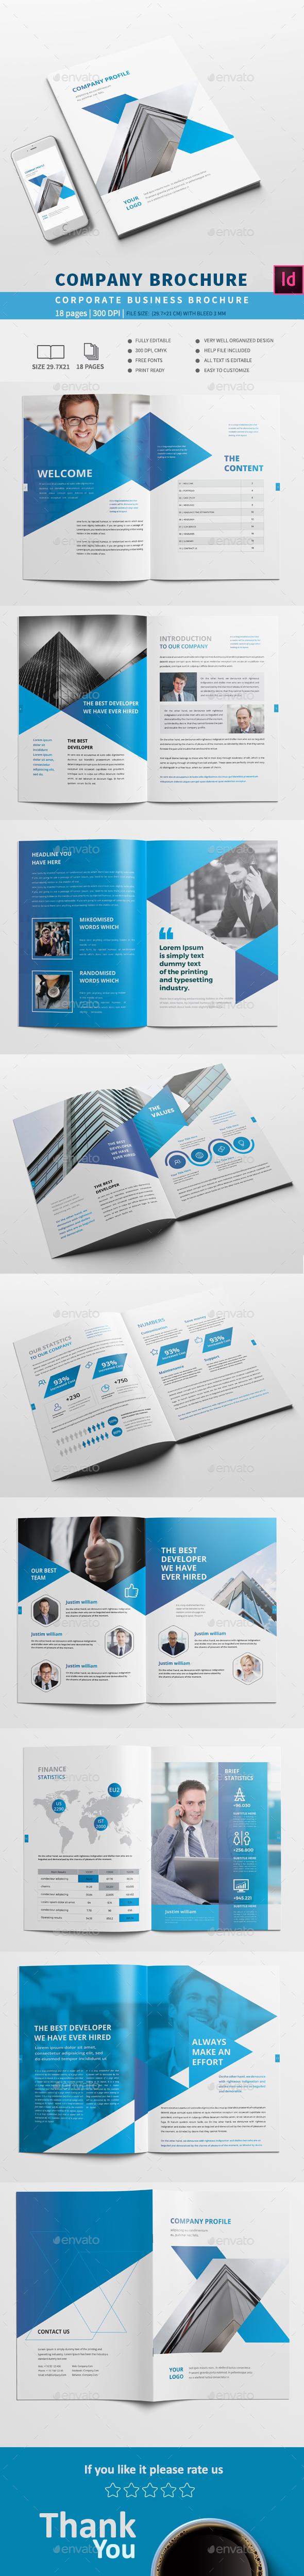 Creative Company Brochure - Corporate Brochures